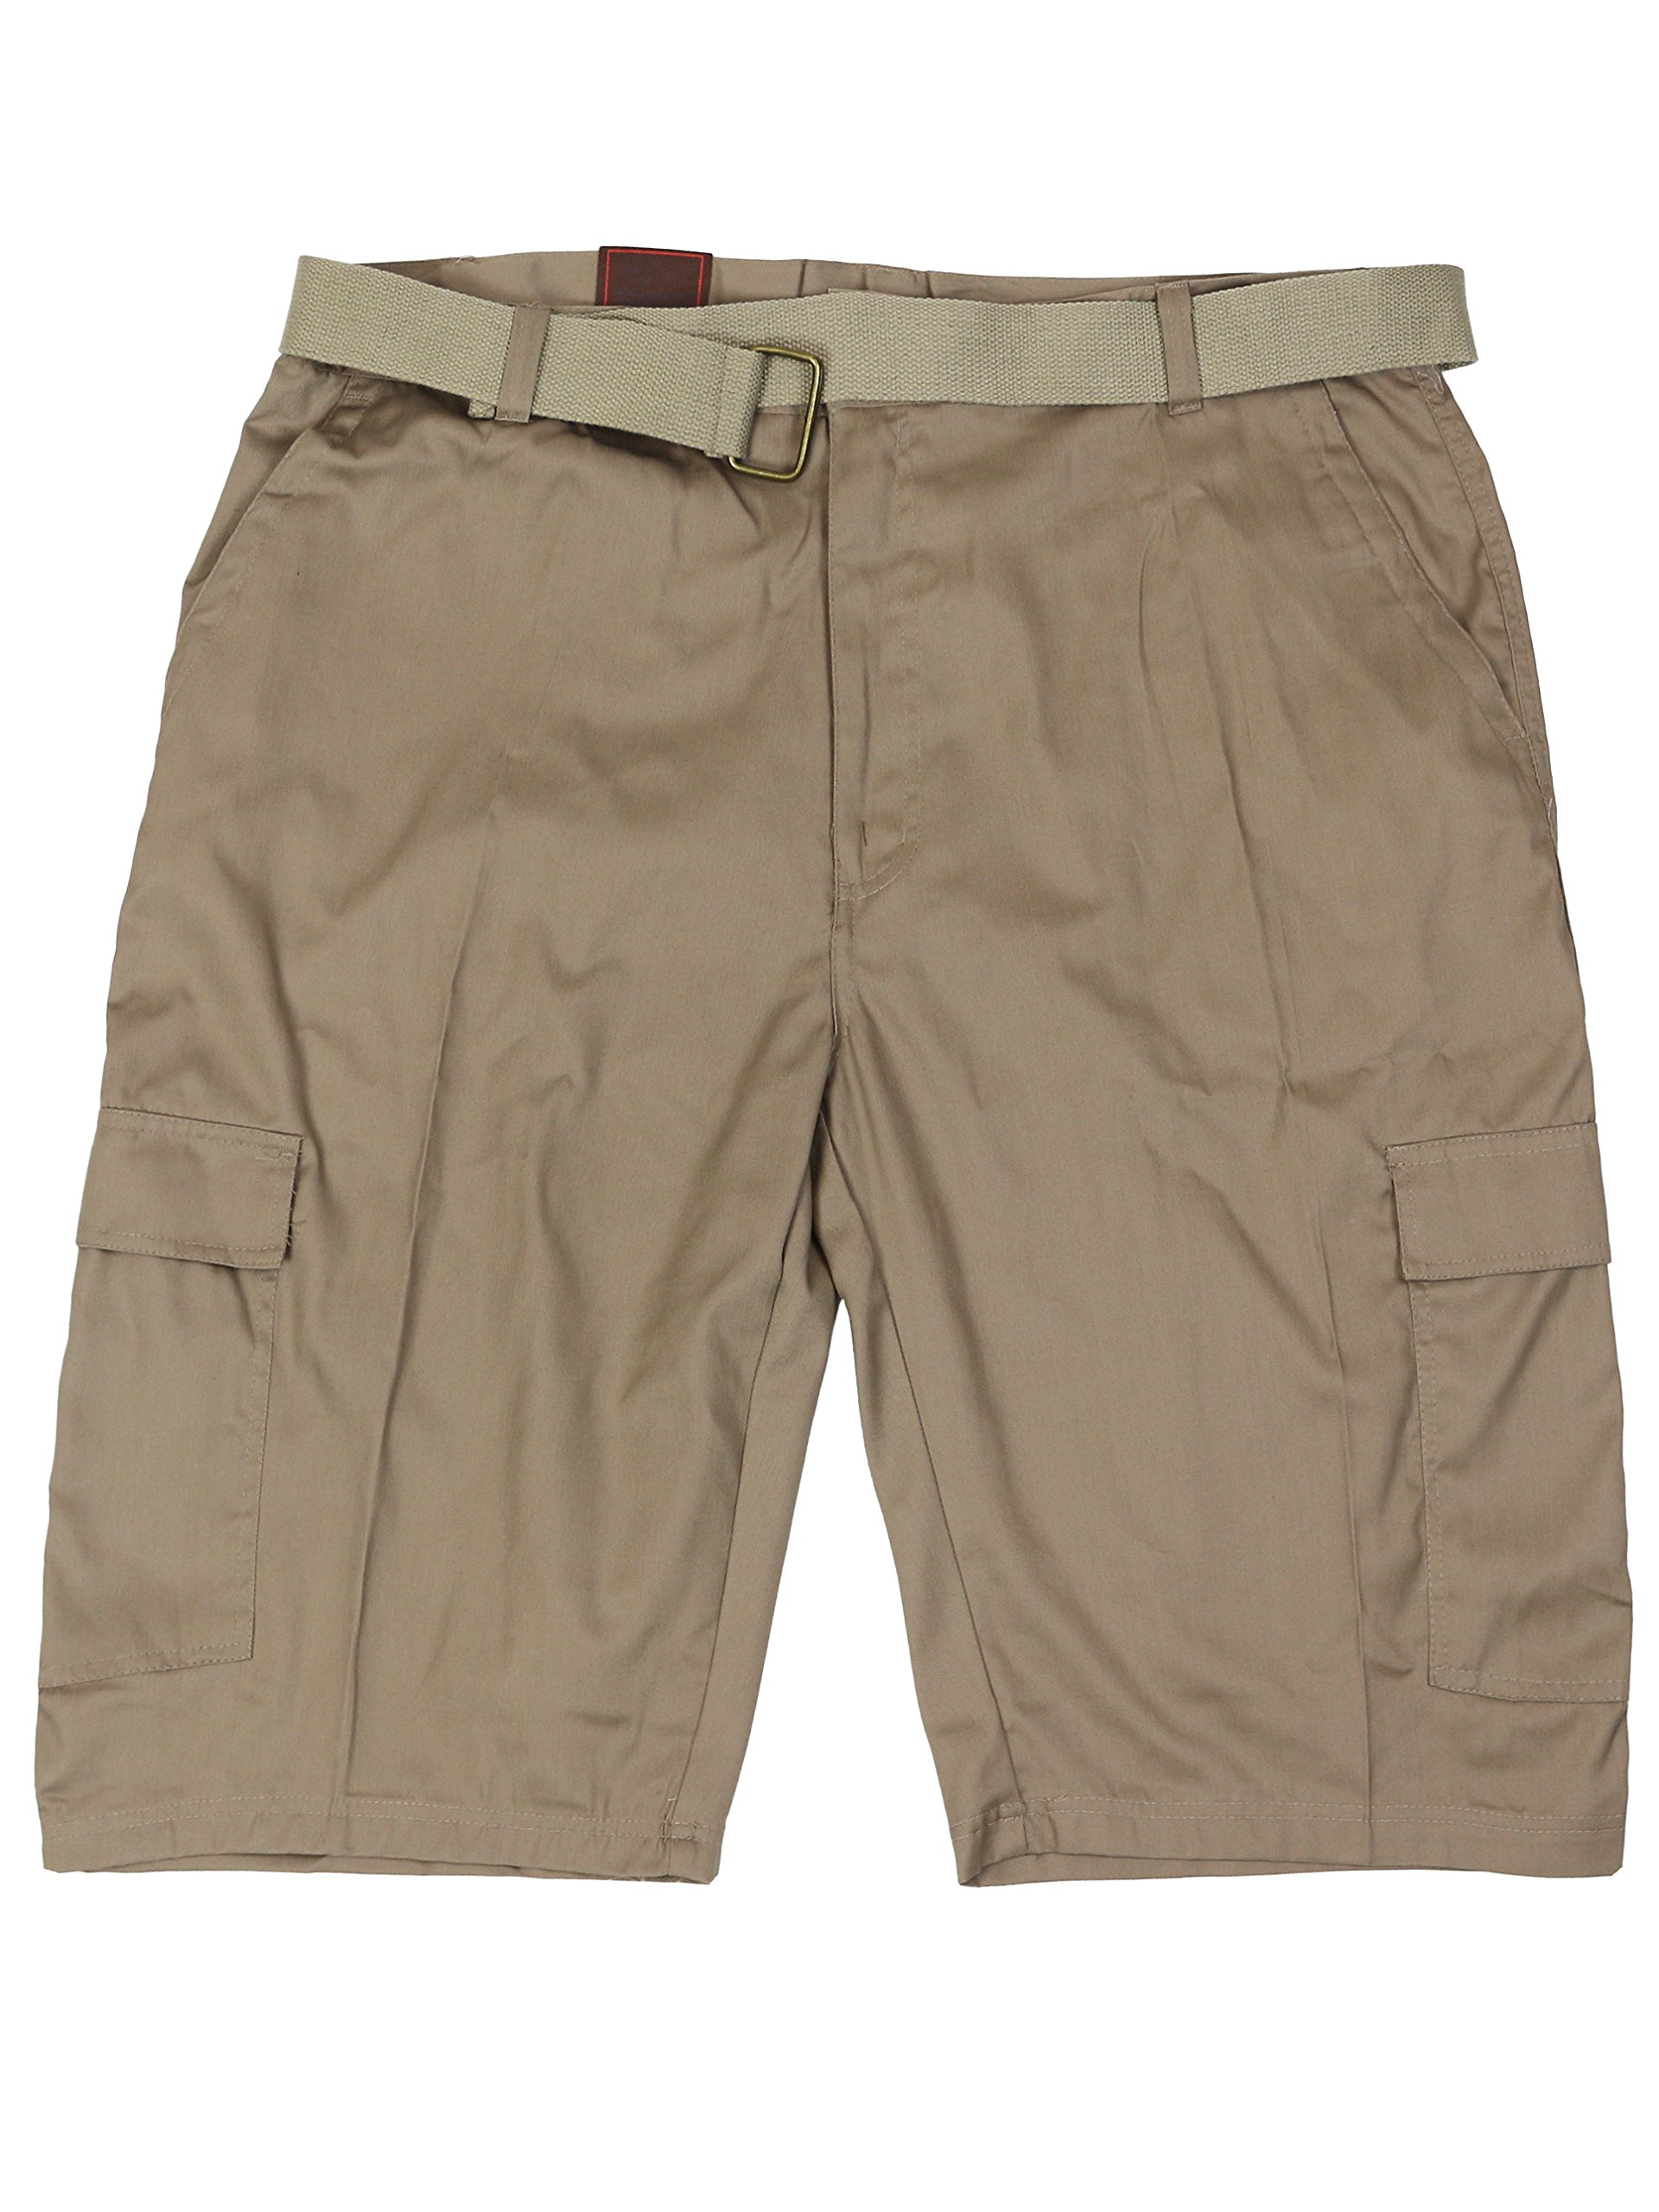 LR Scoop Men's Casual Golf Belted Cargo Dress Shorts Big Plus Sizes (46W, Khaki)